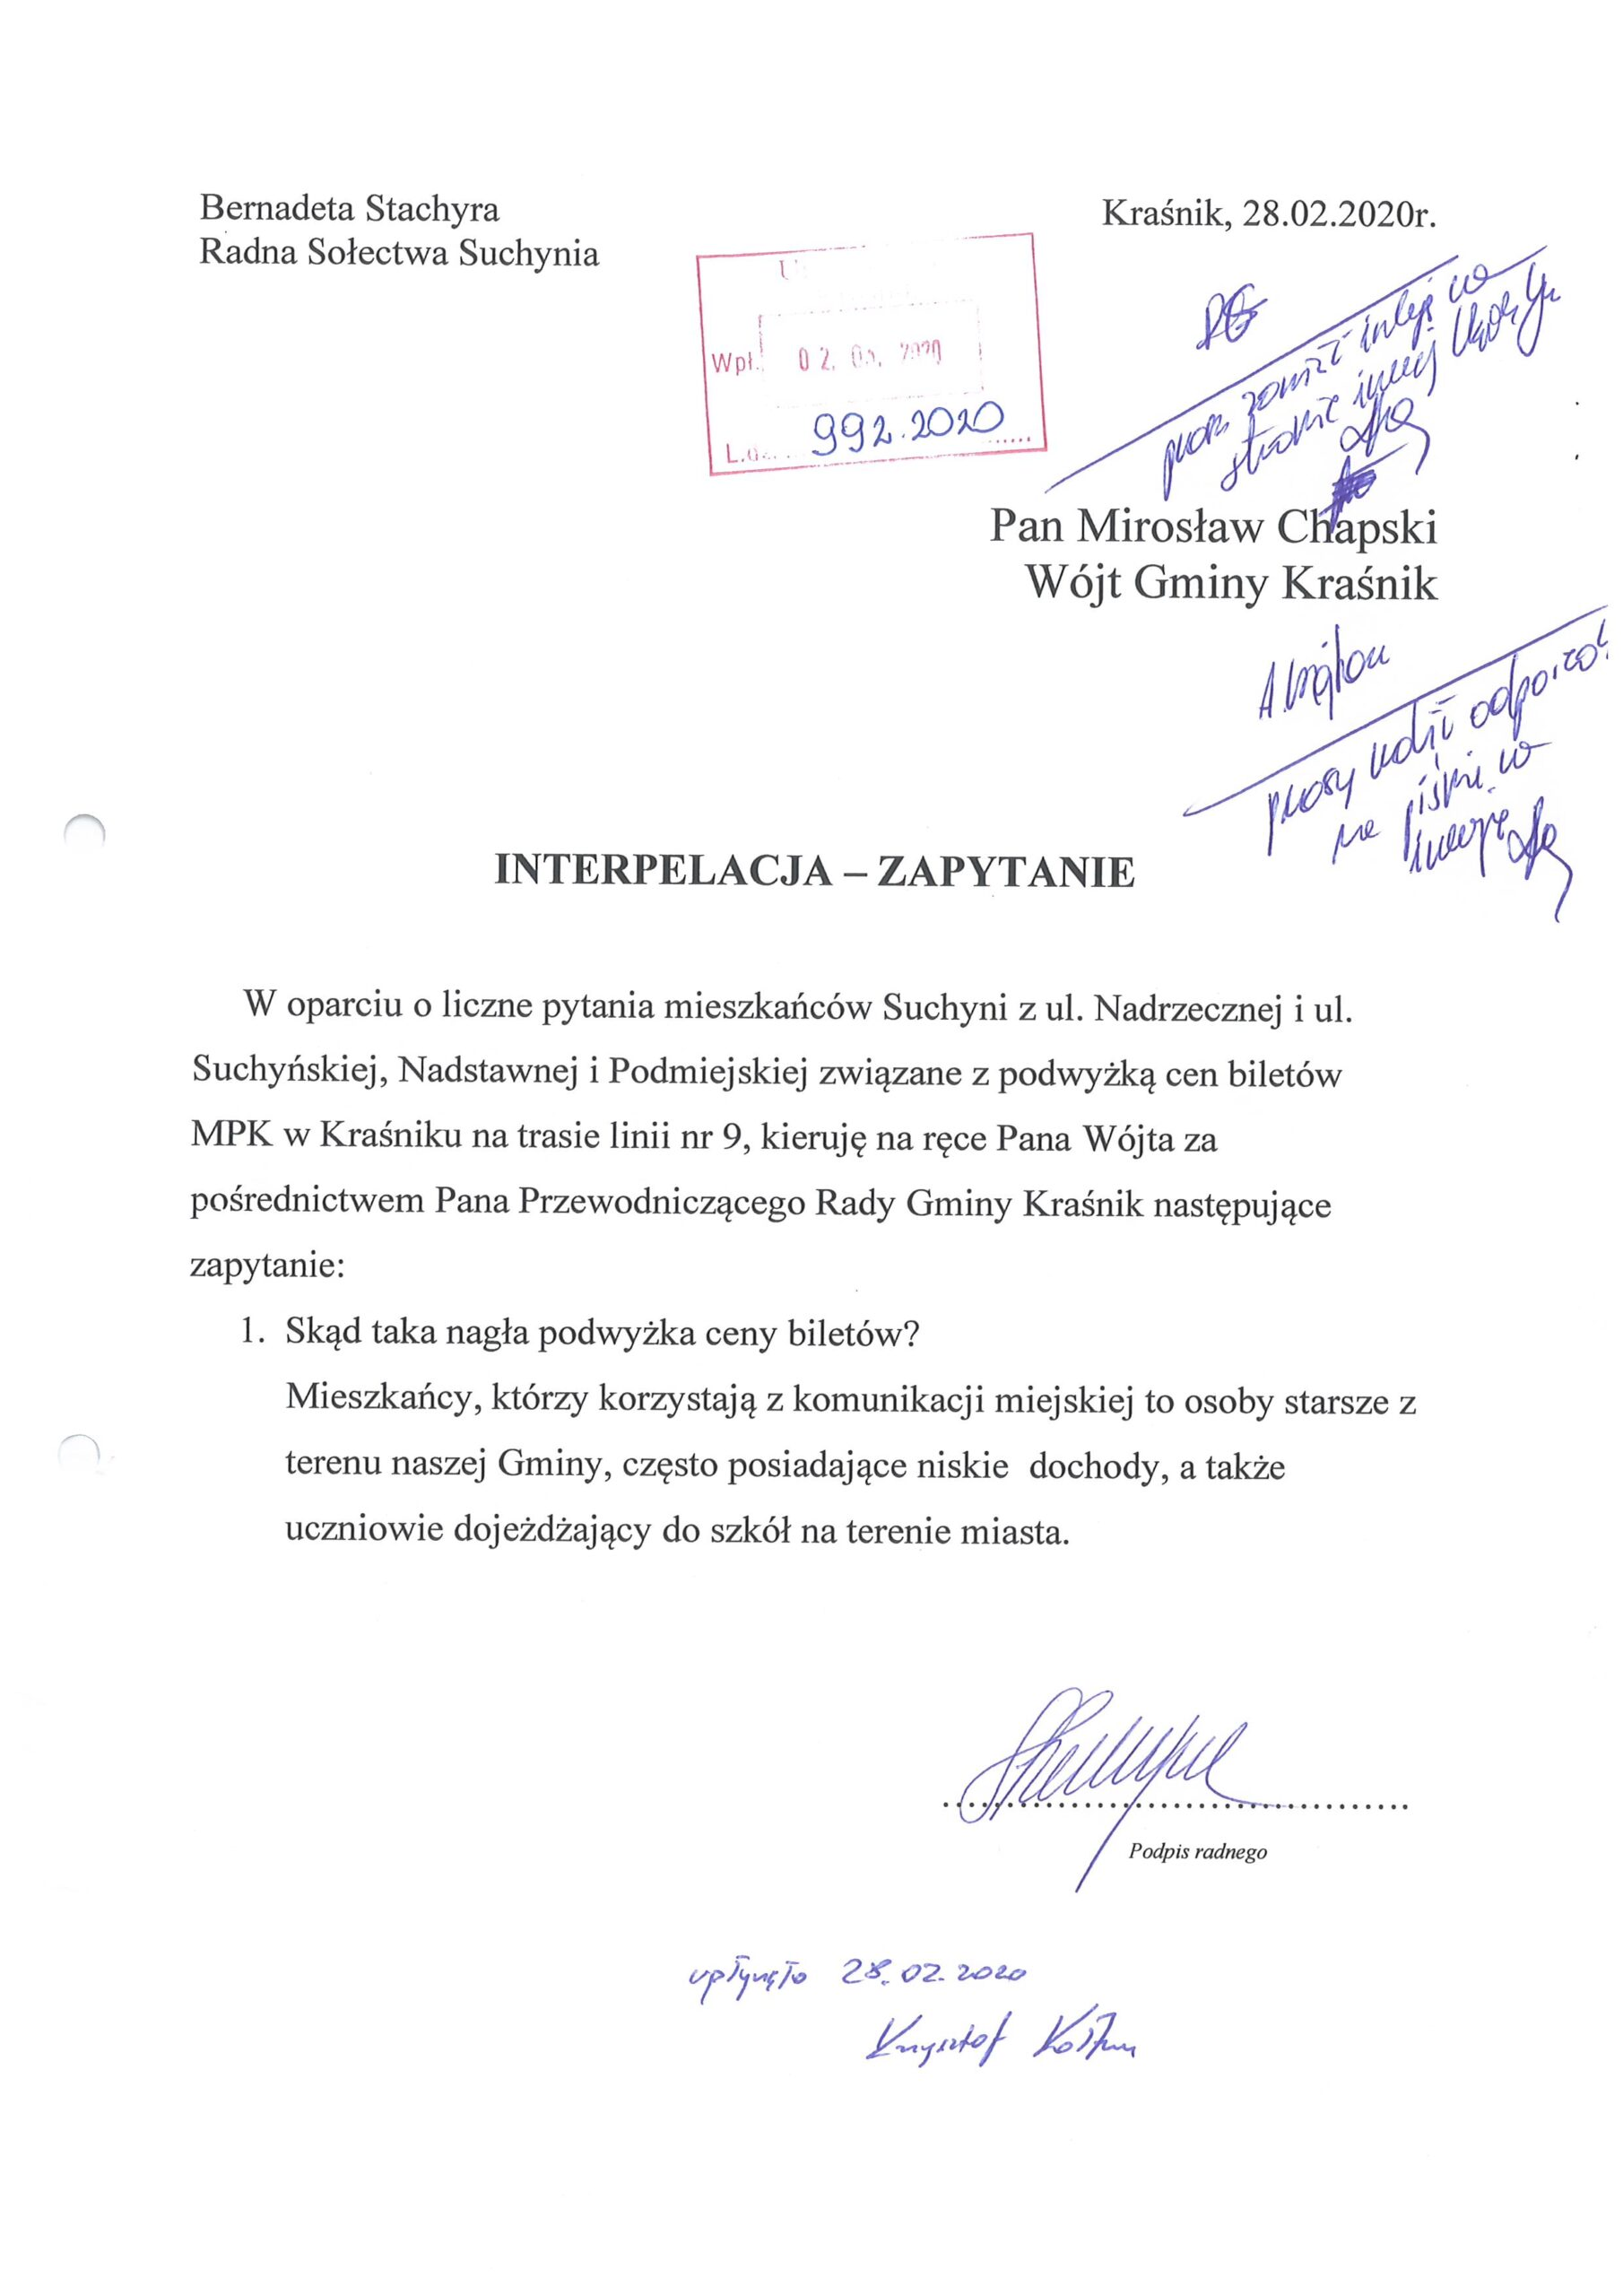 interpelacja Pani Bernadetta Stachyra scaled